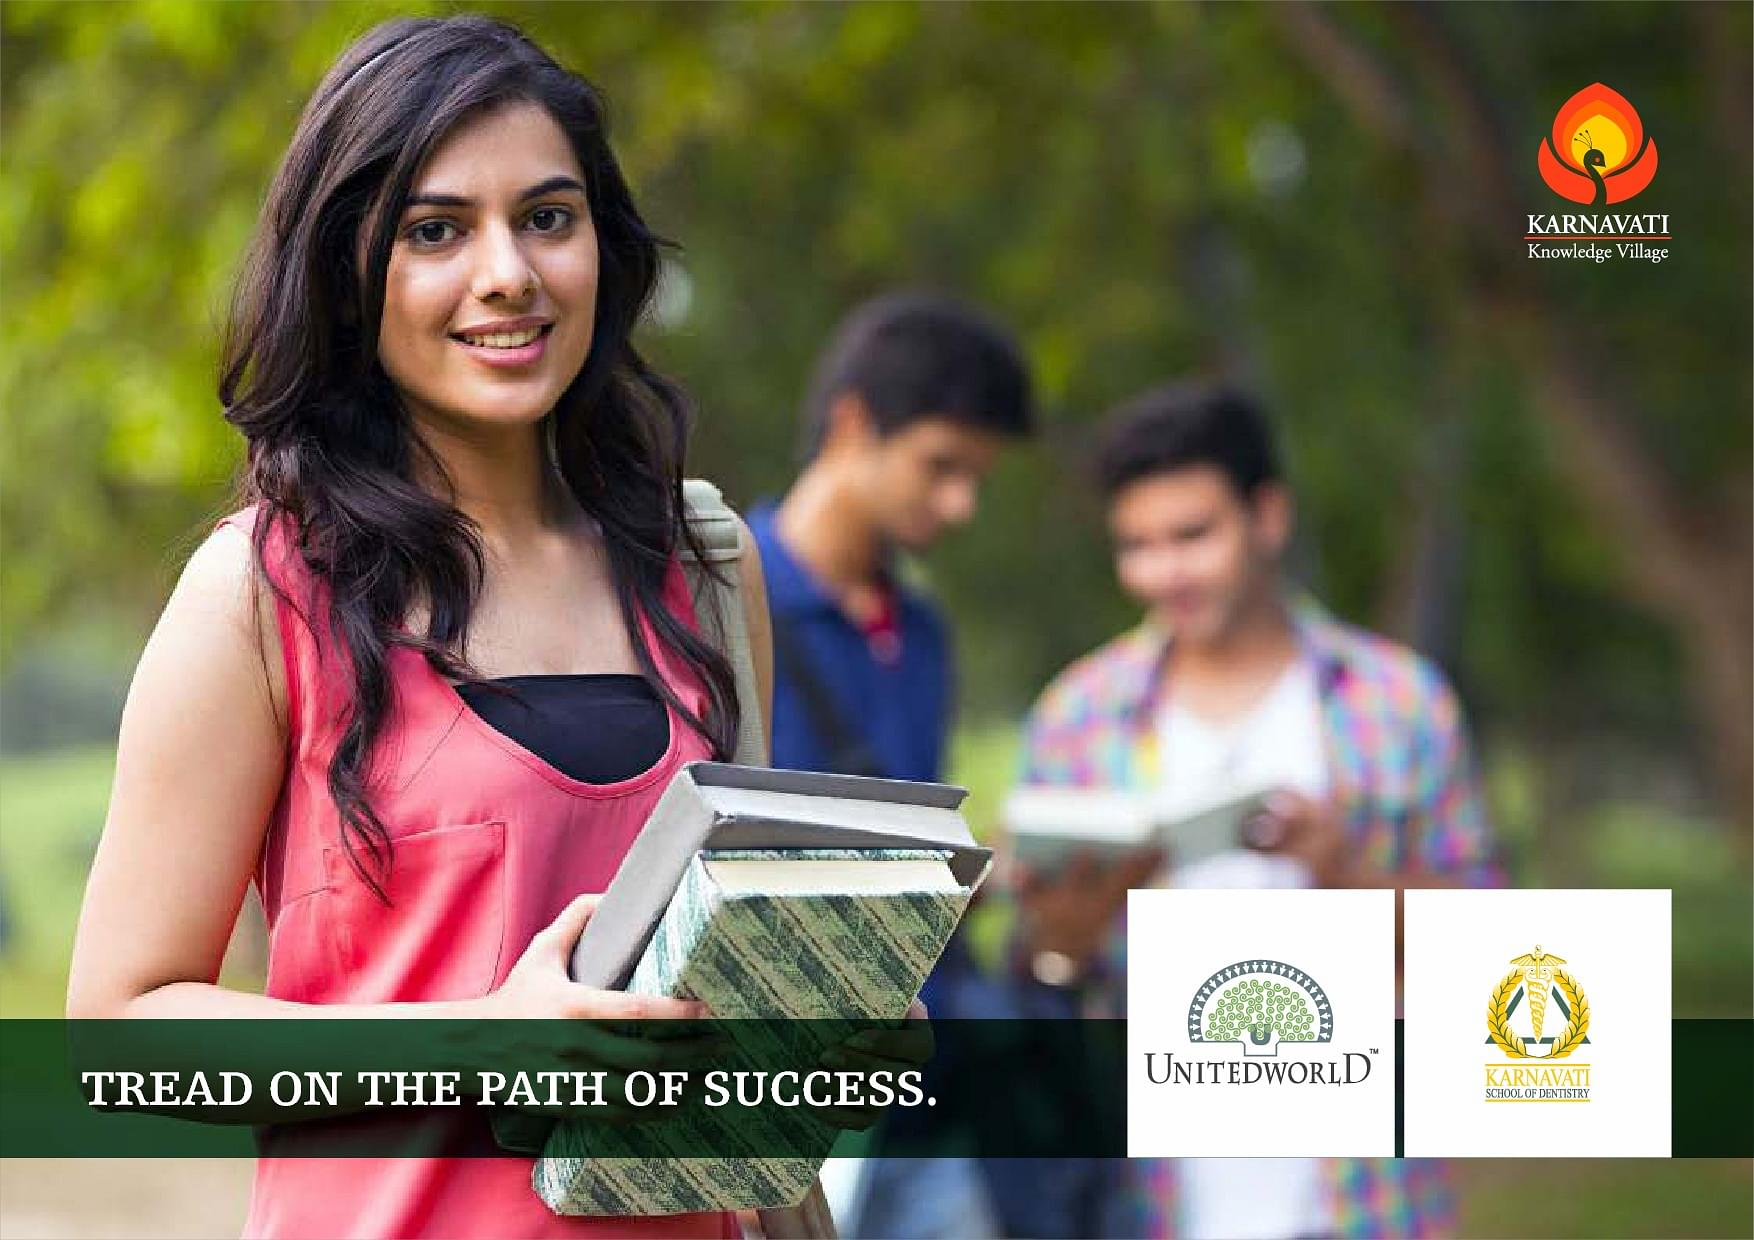 Karnavati University Ku Gandhi Nagar Admissions Contact Website Facilities 2019 2020